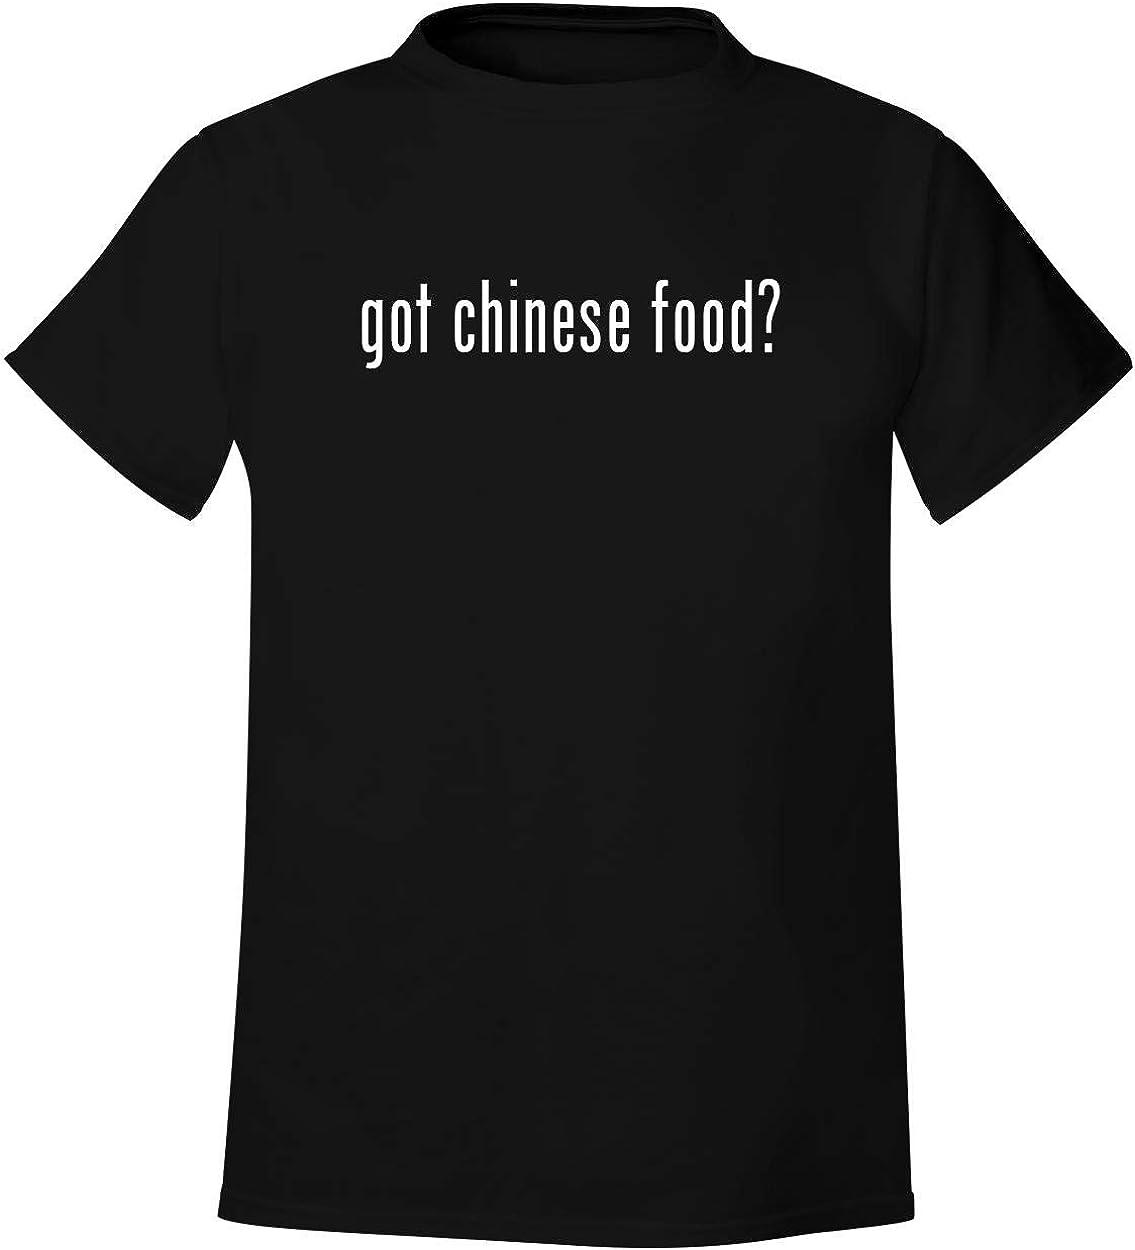 got chinese food? - Men's Soft & Comfortable T-Shirt